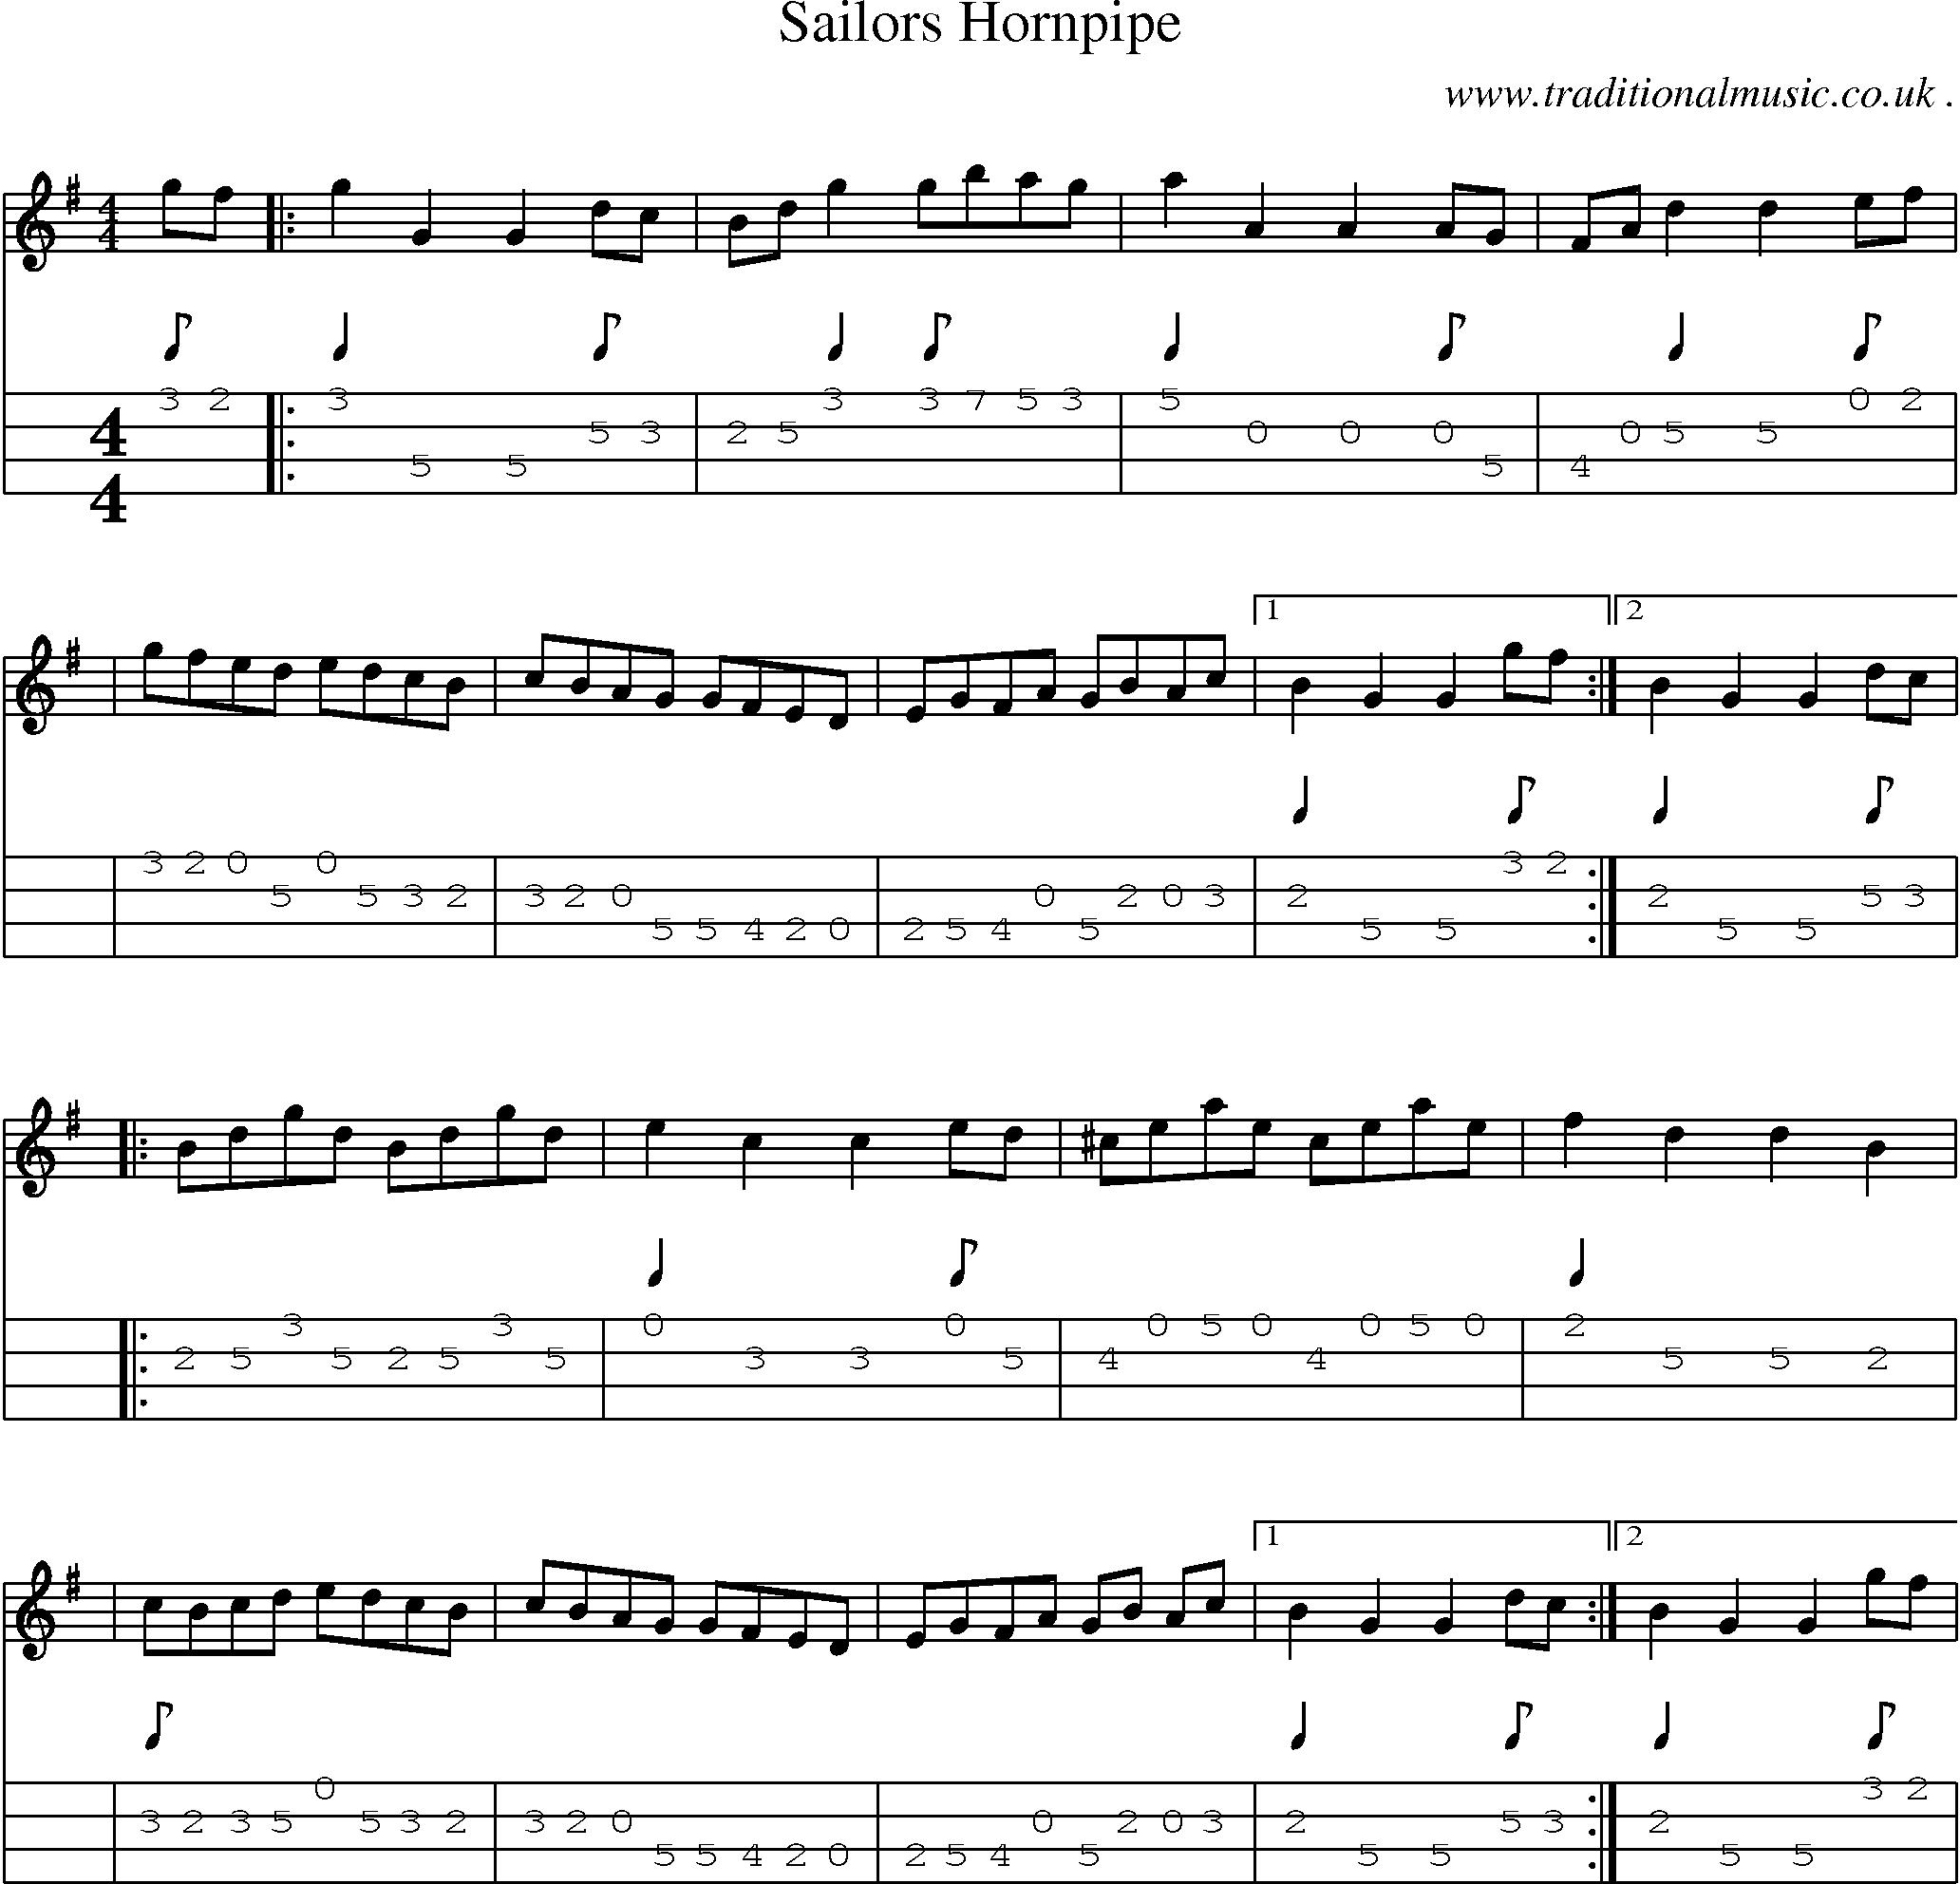 Sheet-Music and Mandolin Tabs for Sailors Hornpipe | Mandolin jams